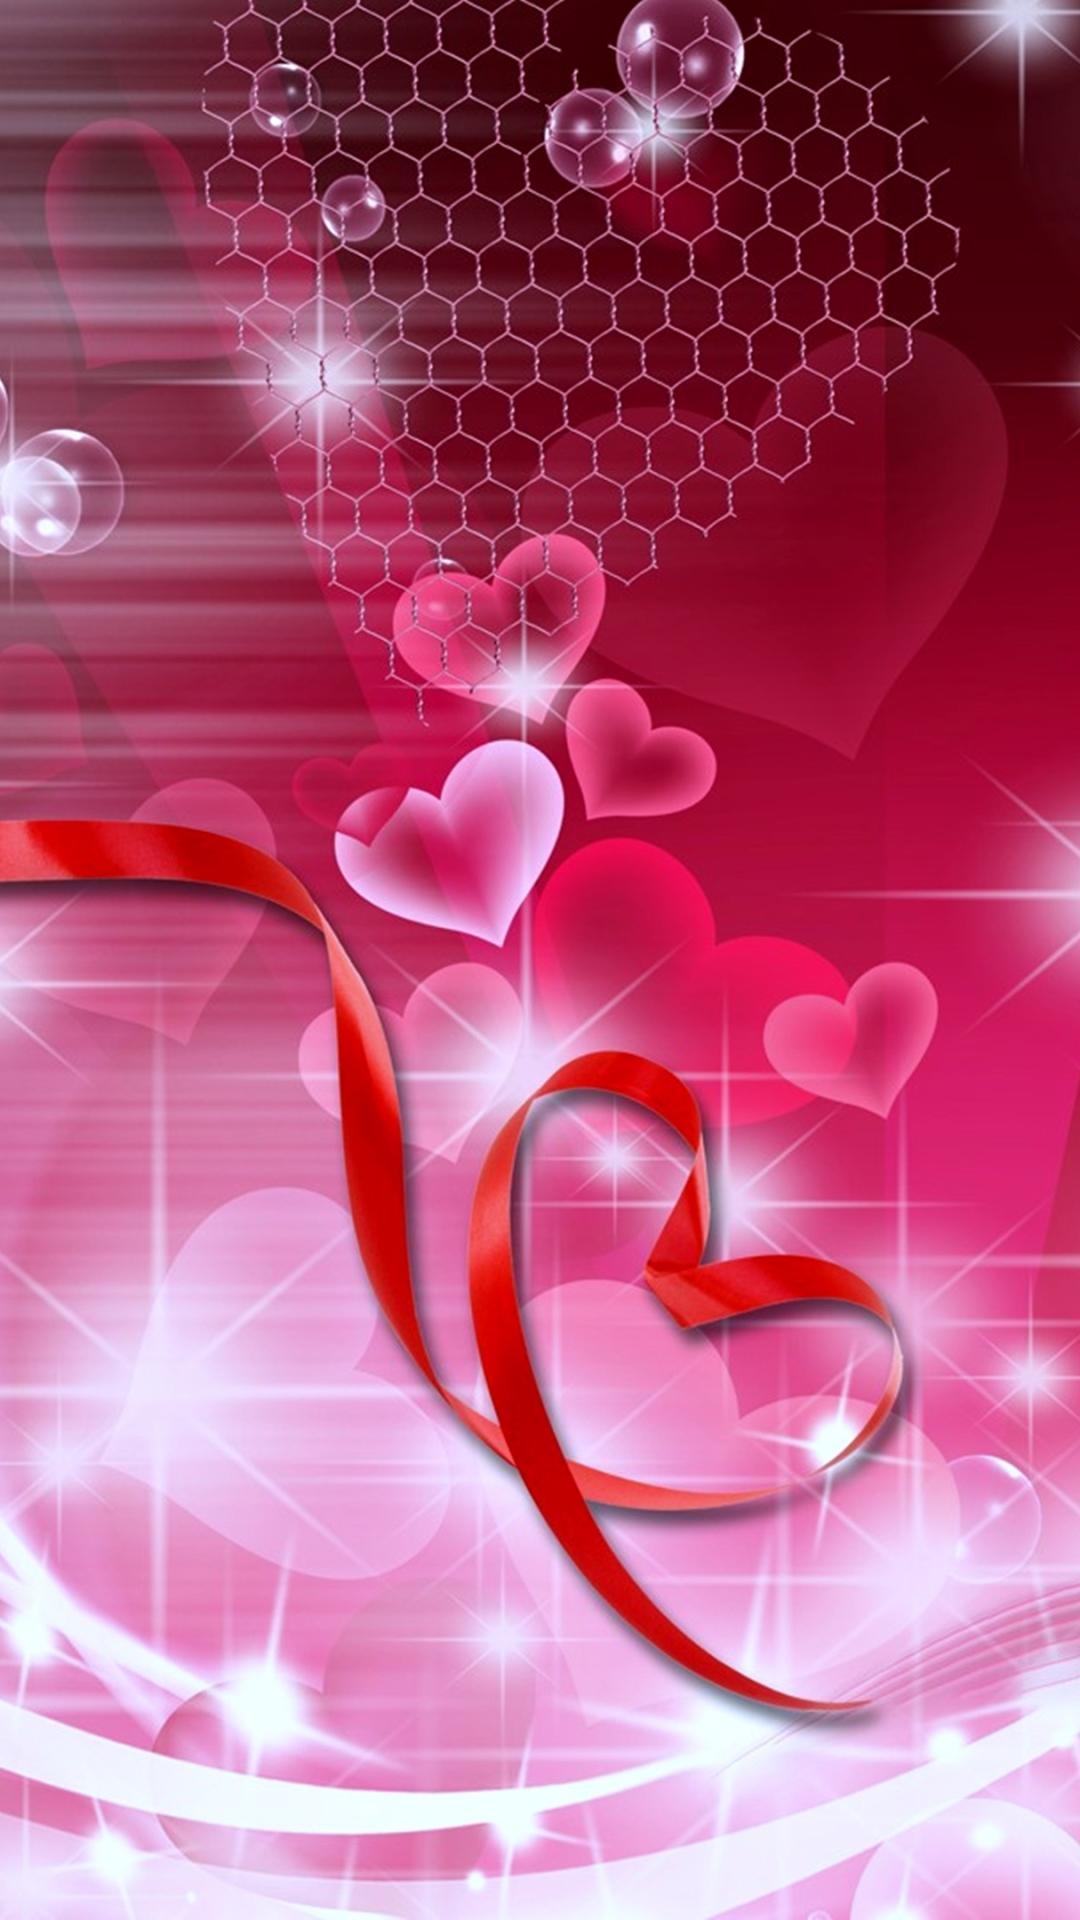 Love Romantic Mobile Wallpapers Wallpaper Cave